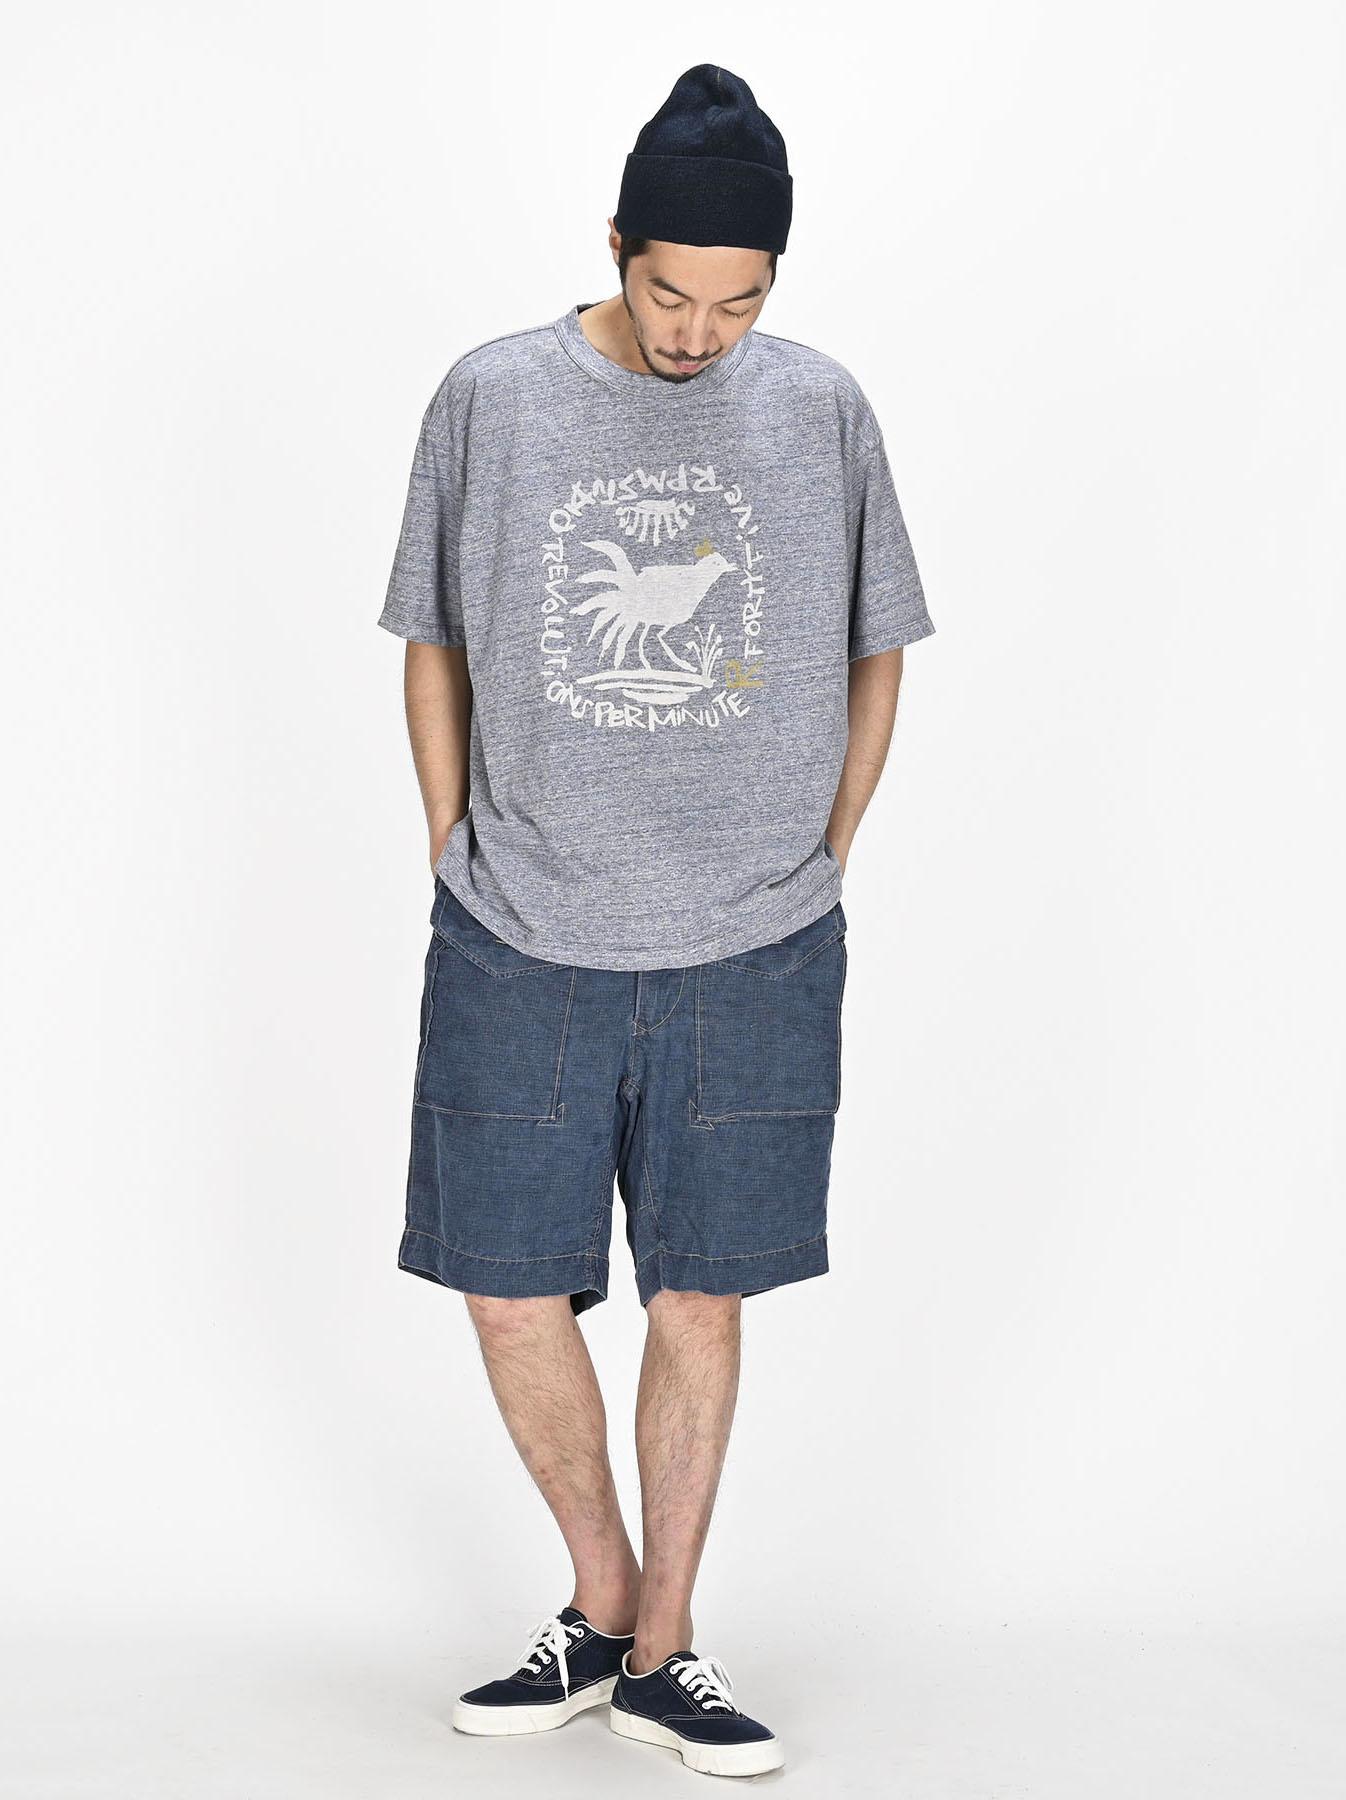 Top Sumite de Chicken T-shirt-5